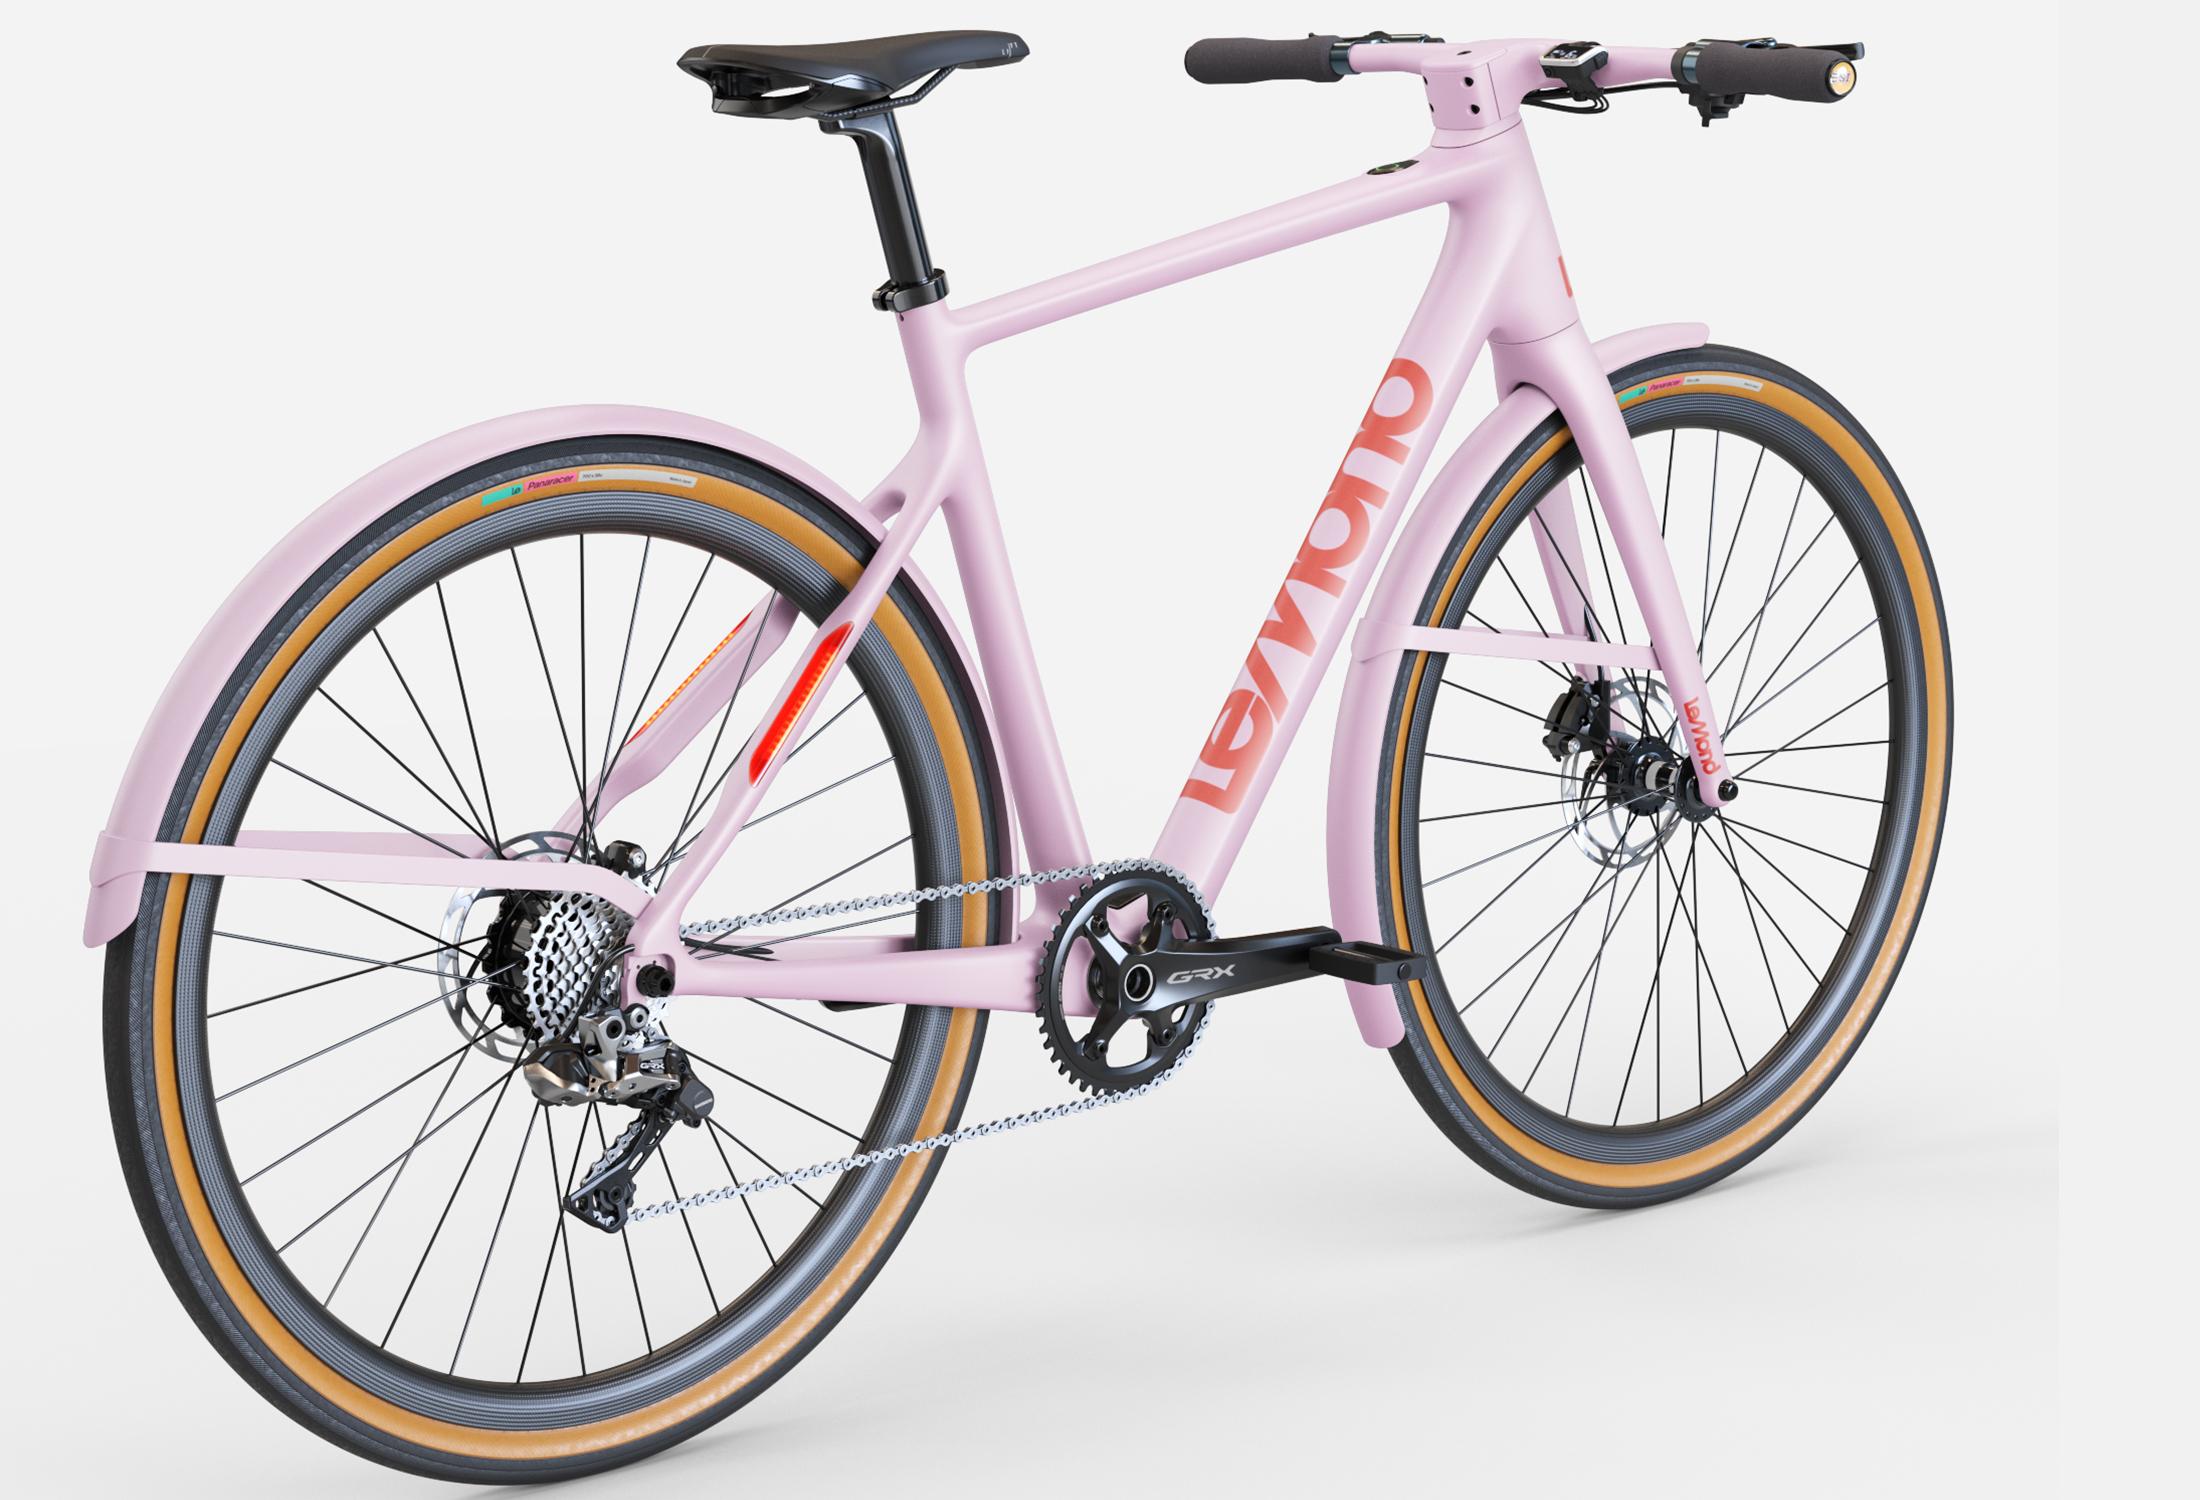 lemond e-bike